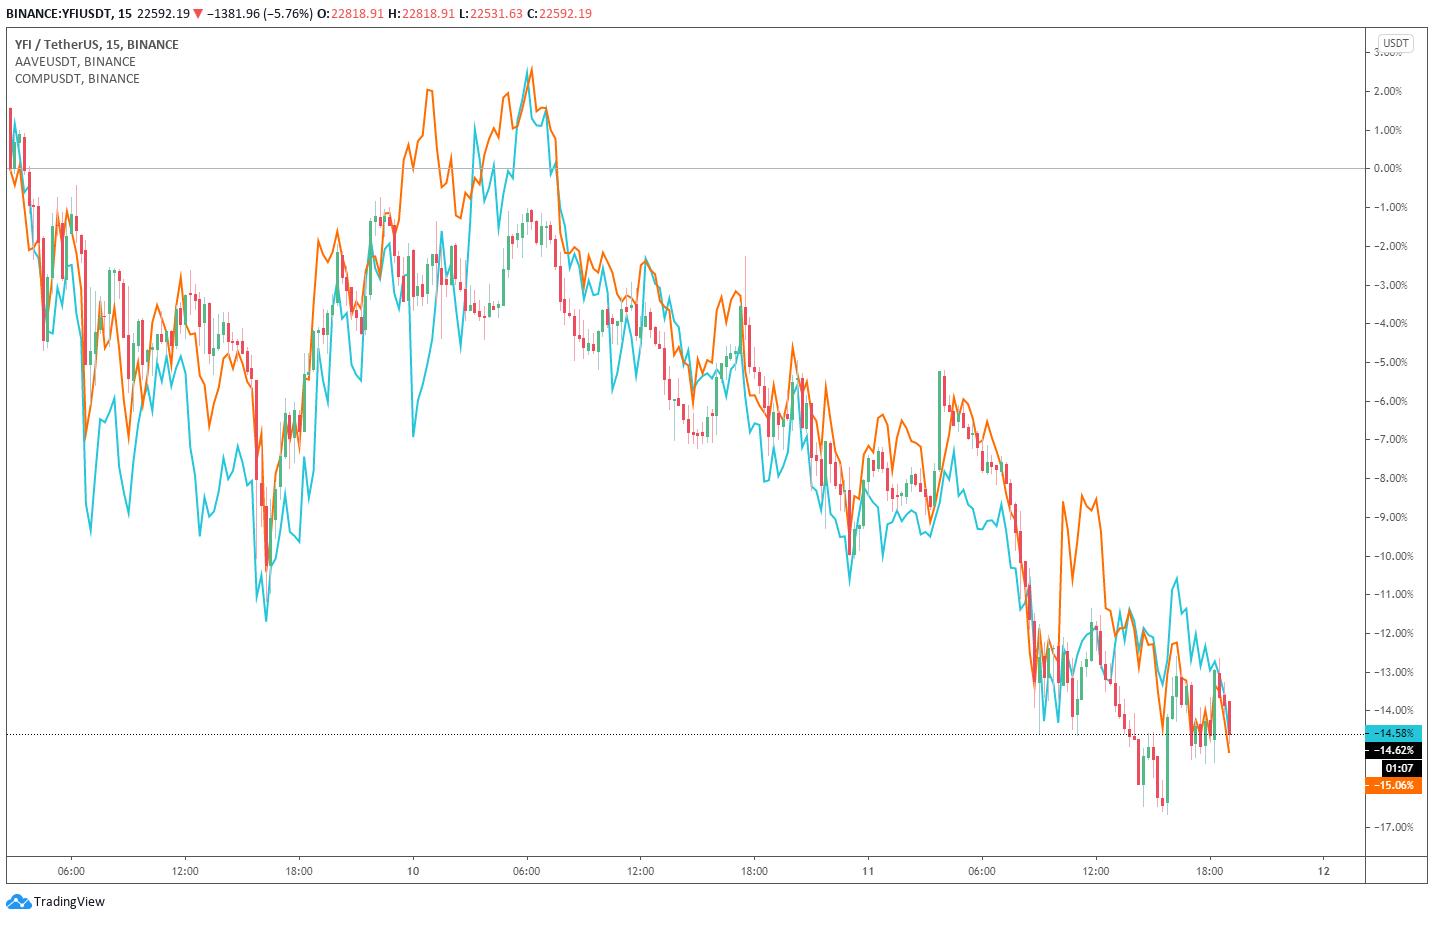 Grafico a 15 minuti di Yearn.finance, AAVE, COMP (Binance)